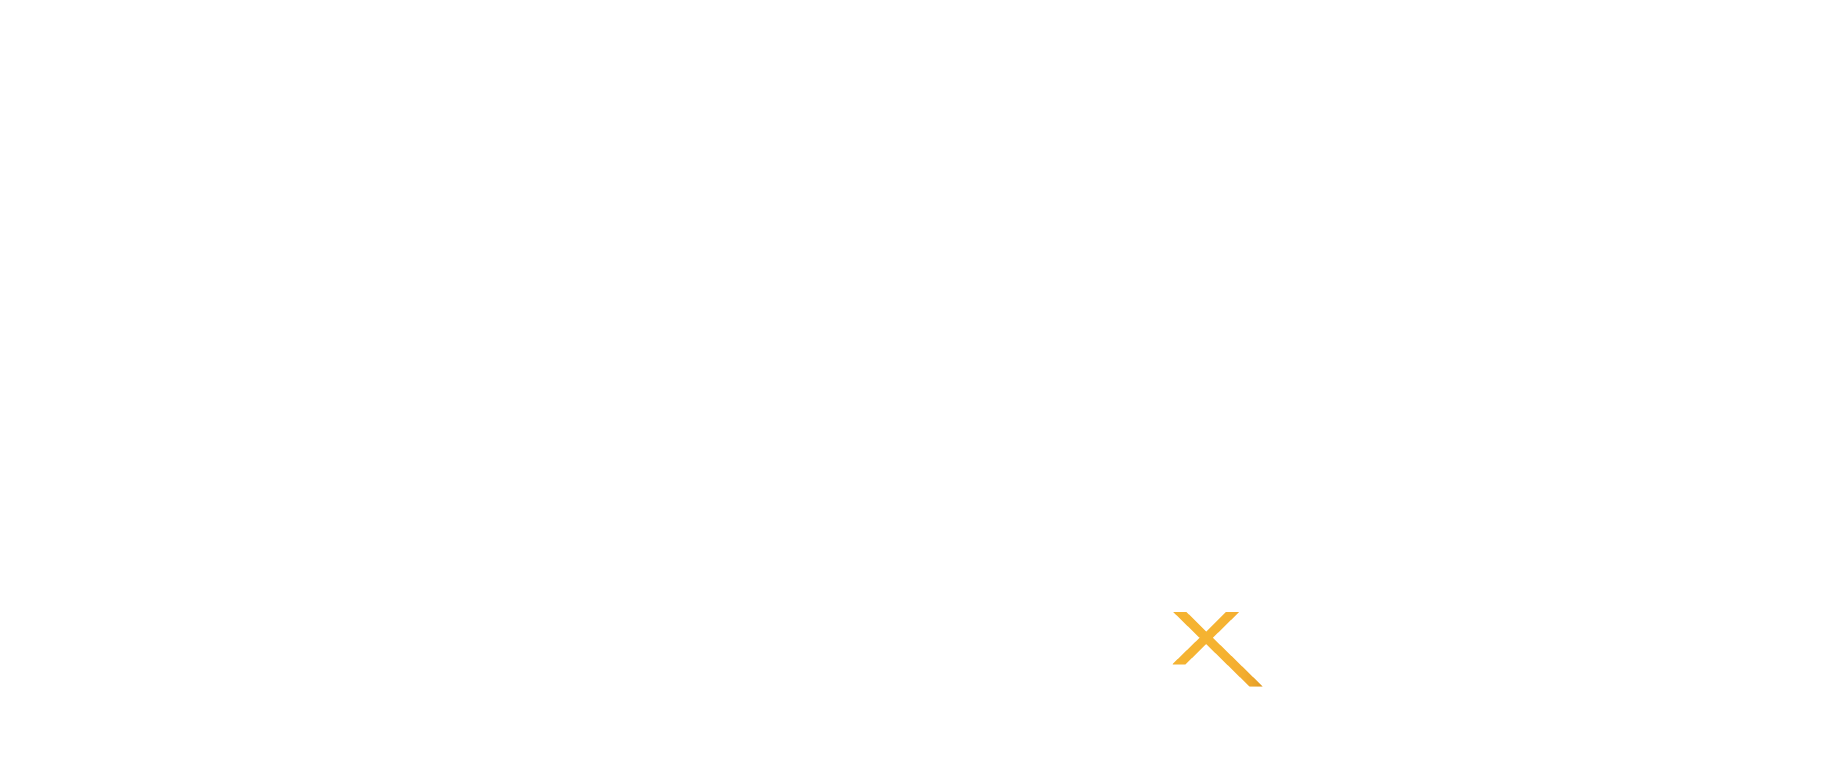 Decillion-logo-with-bmx-tagline-02.png